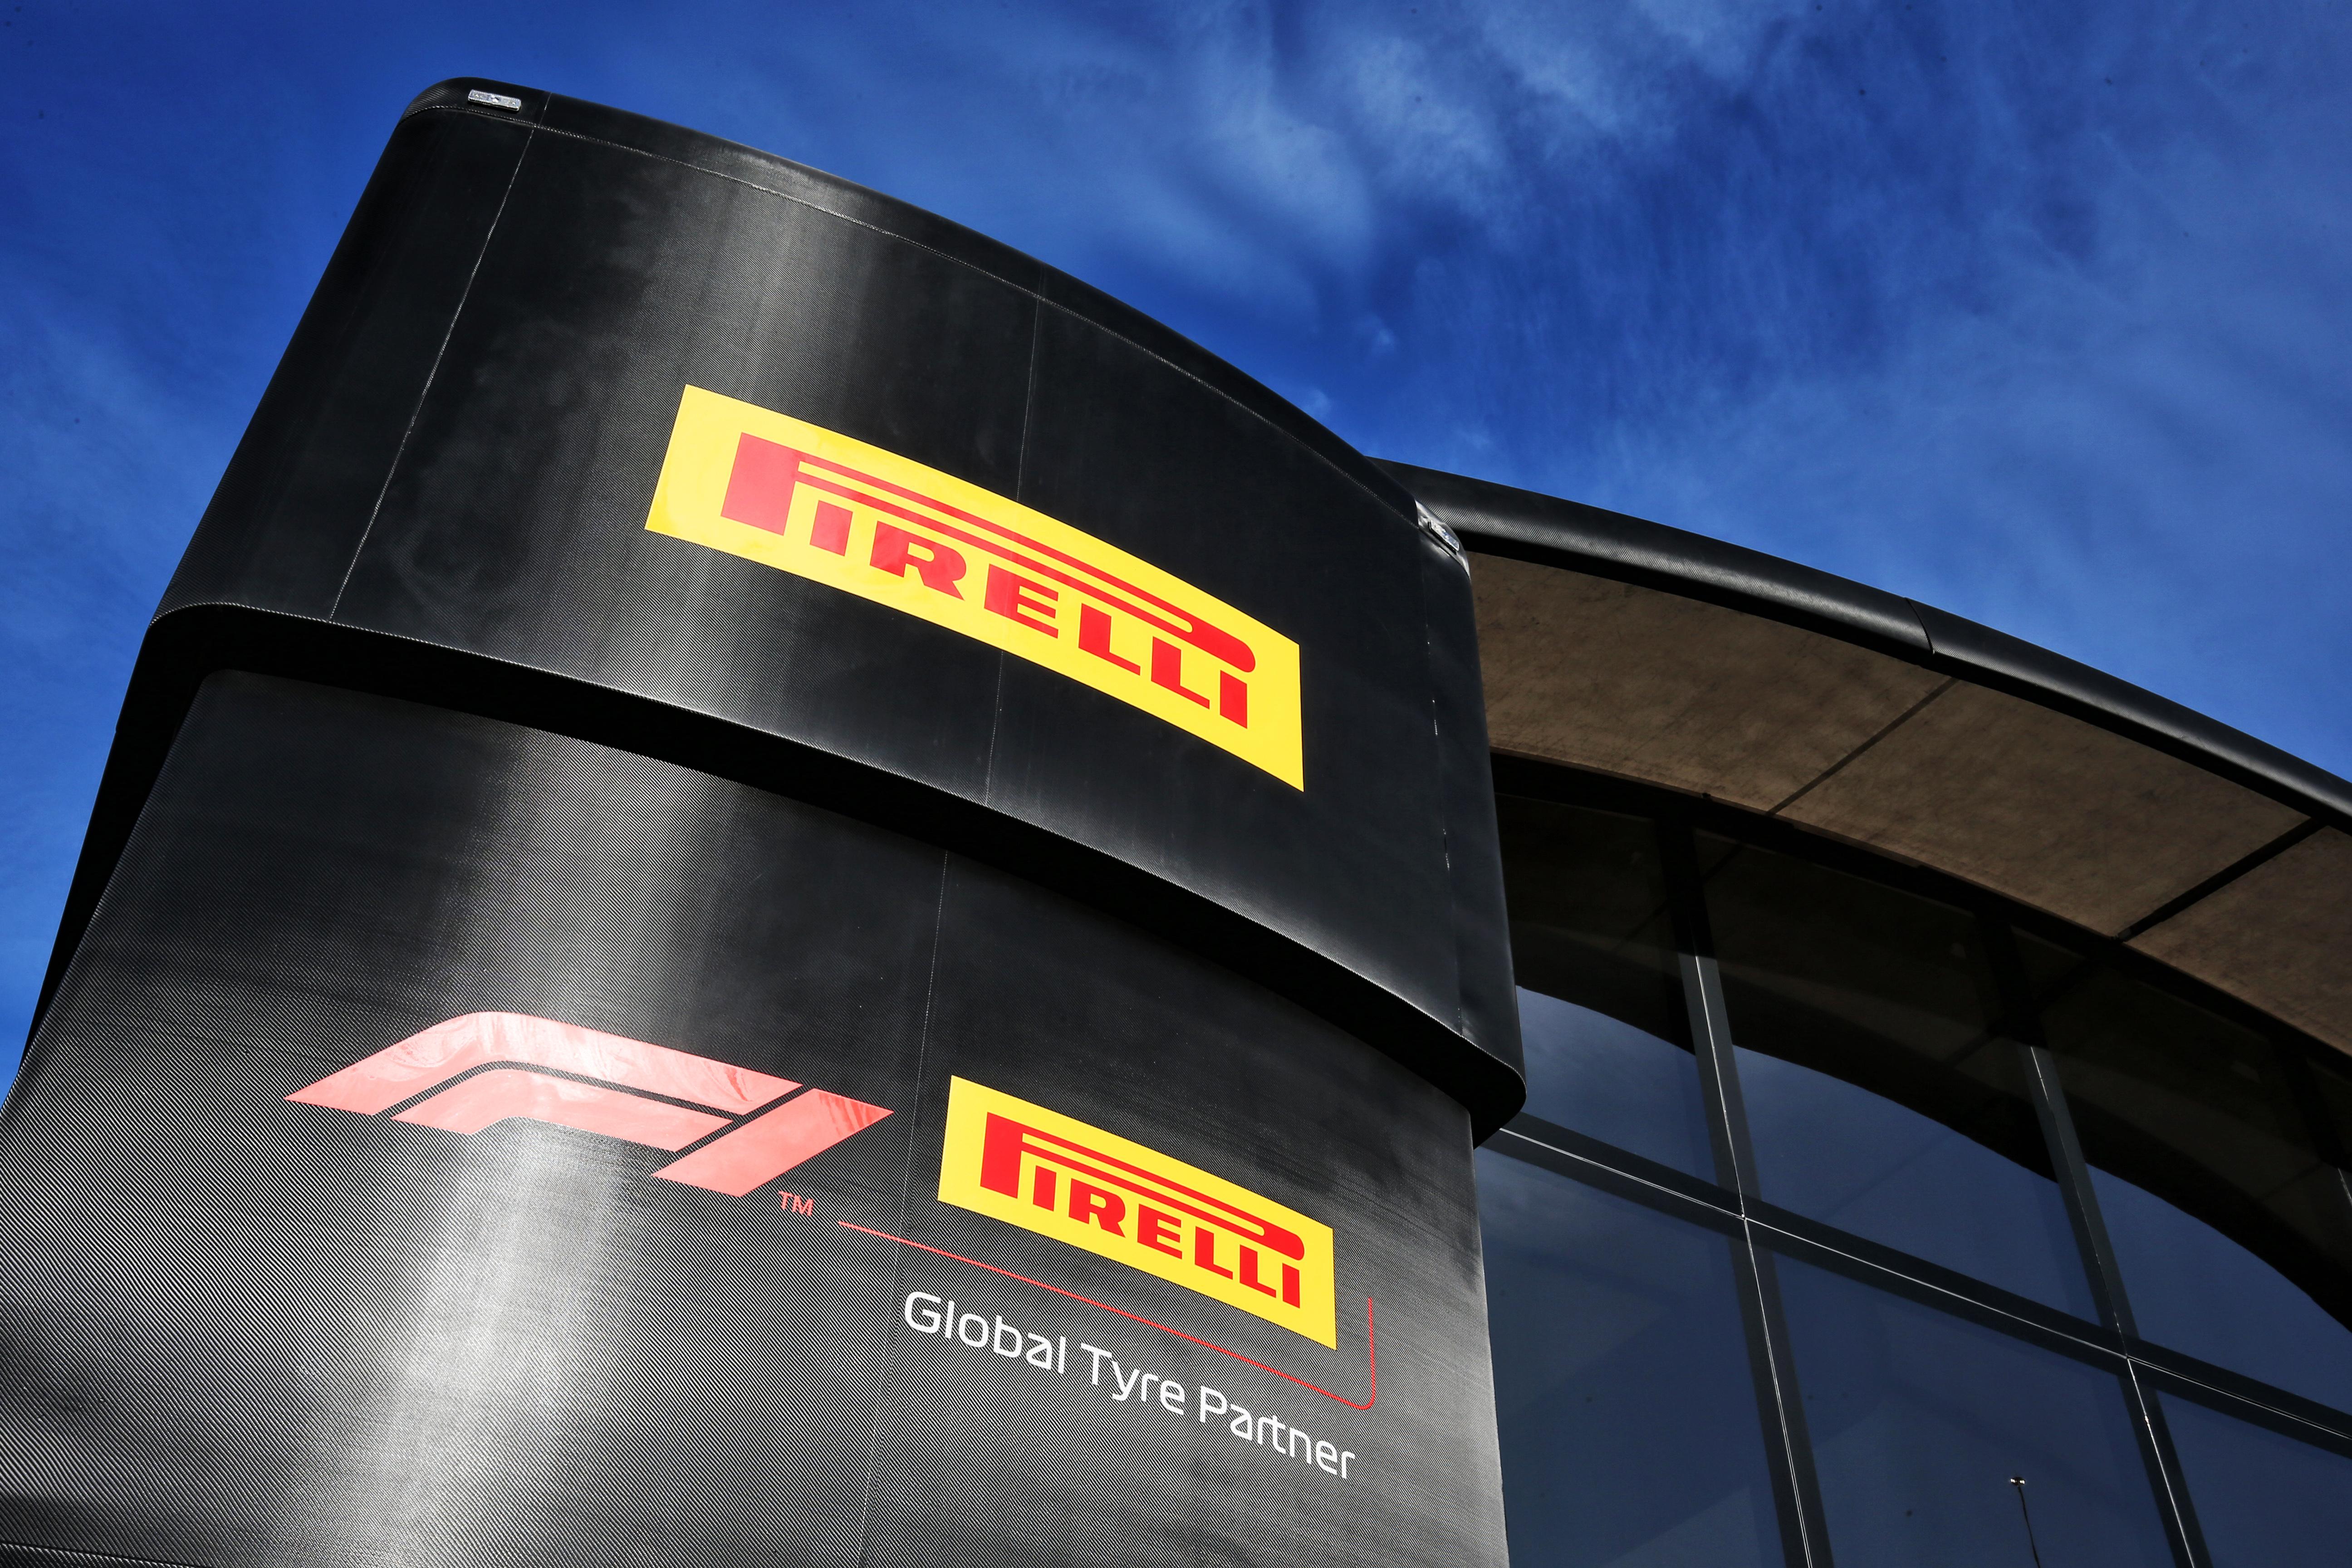 Motor Racing Formula One Testing Test Two Day 1 Barcelona, Spain